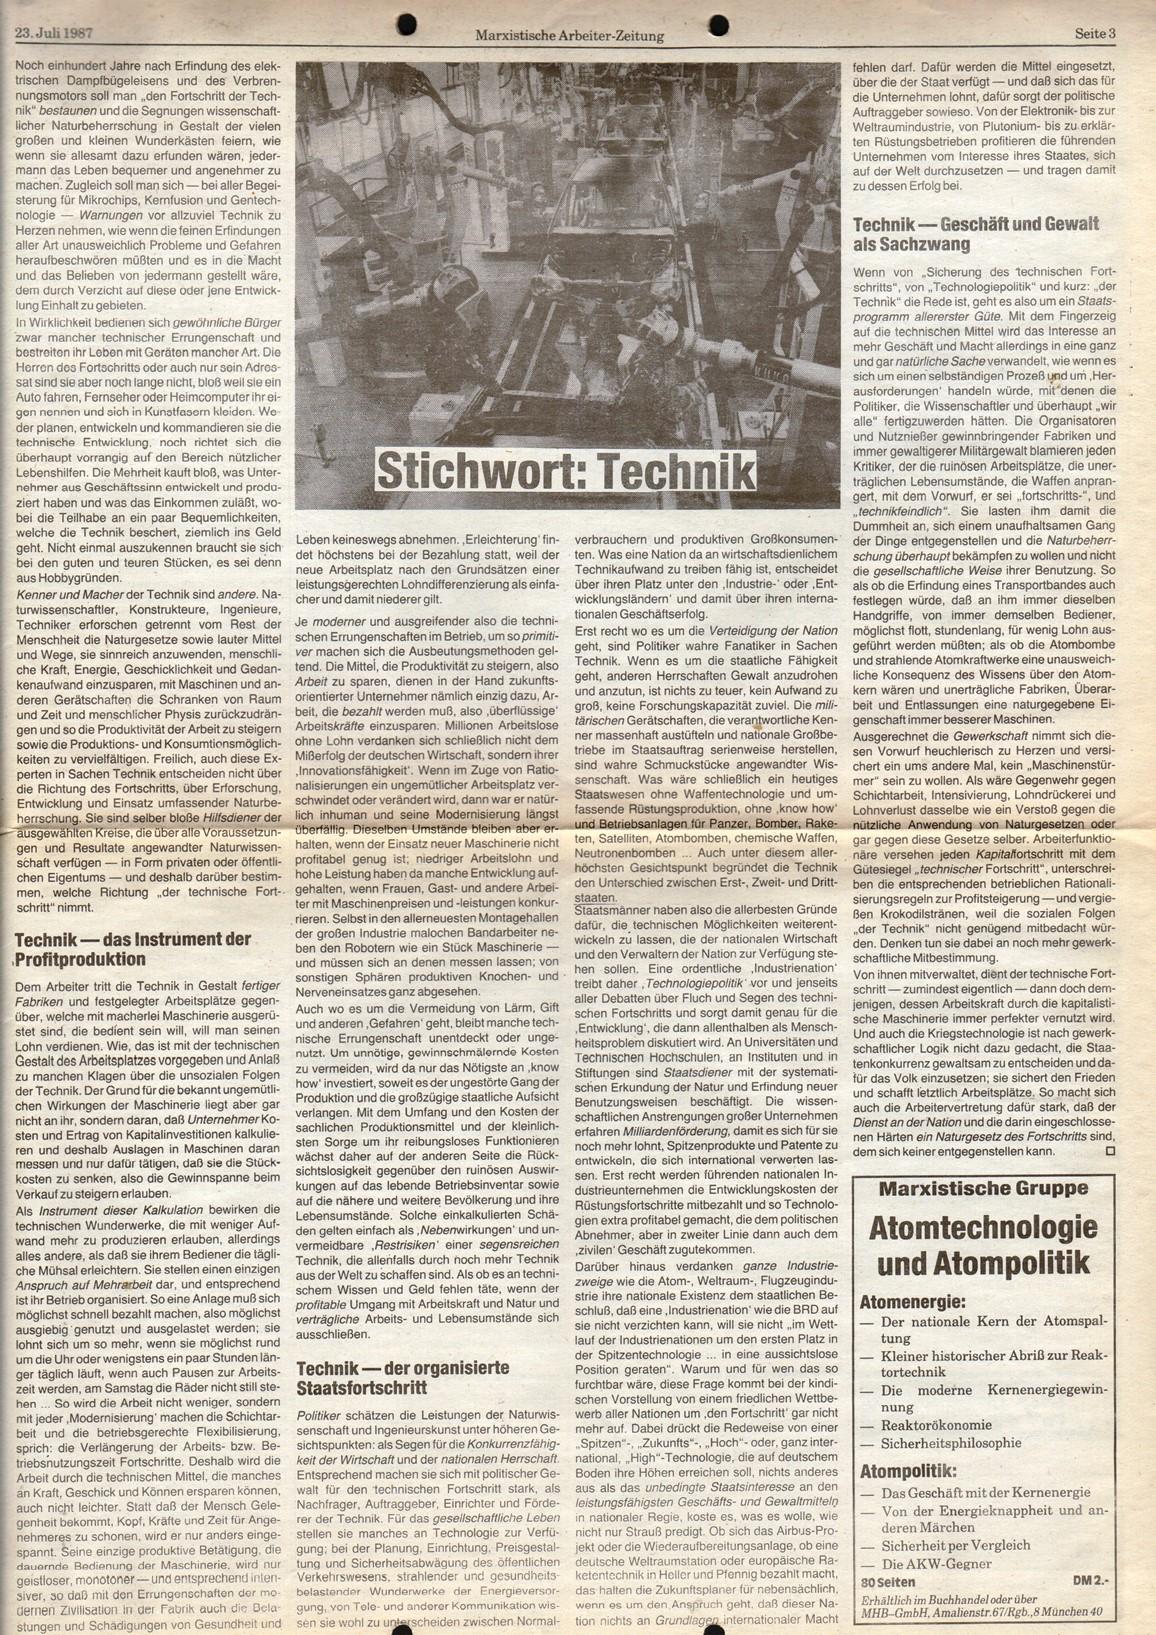 Muenchen_MG_MAZ_19870723_03